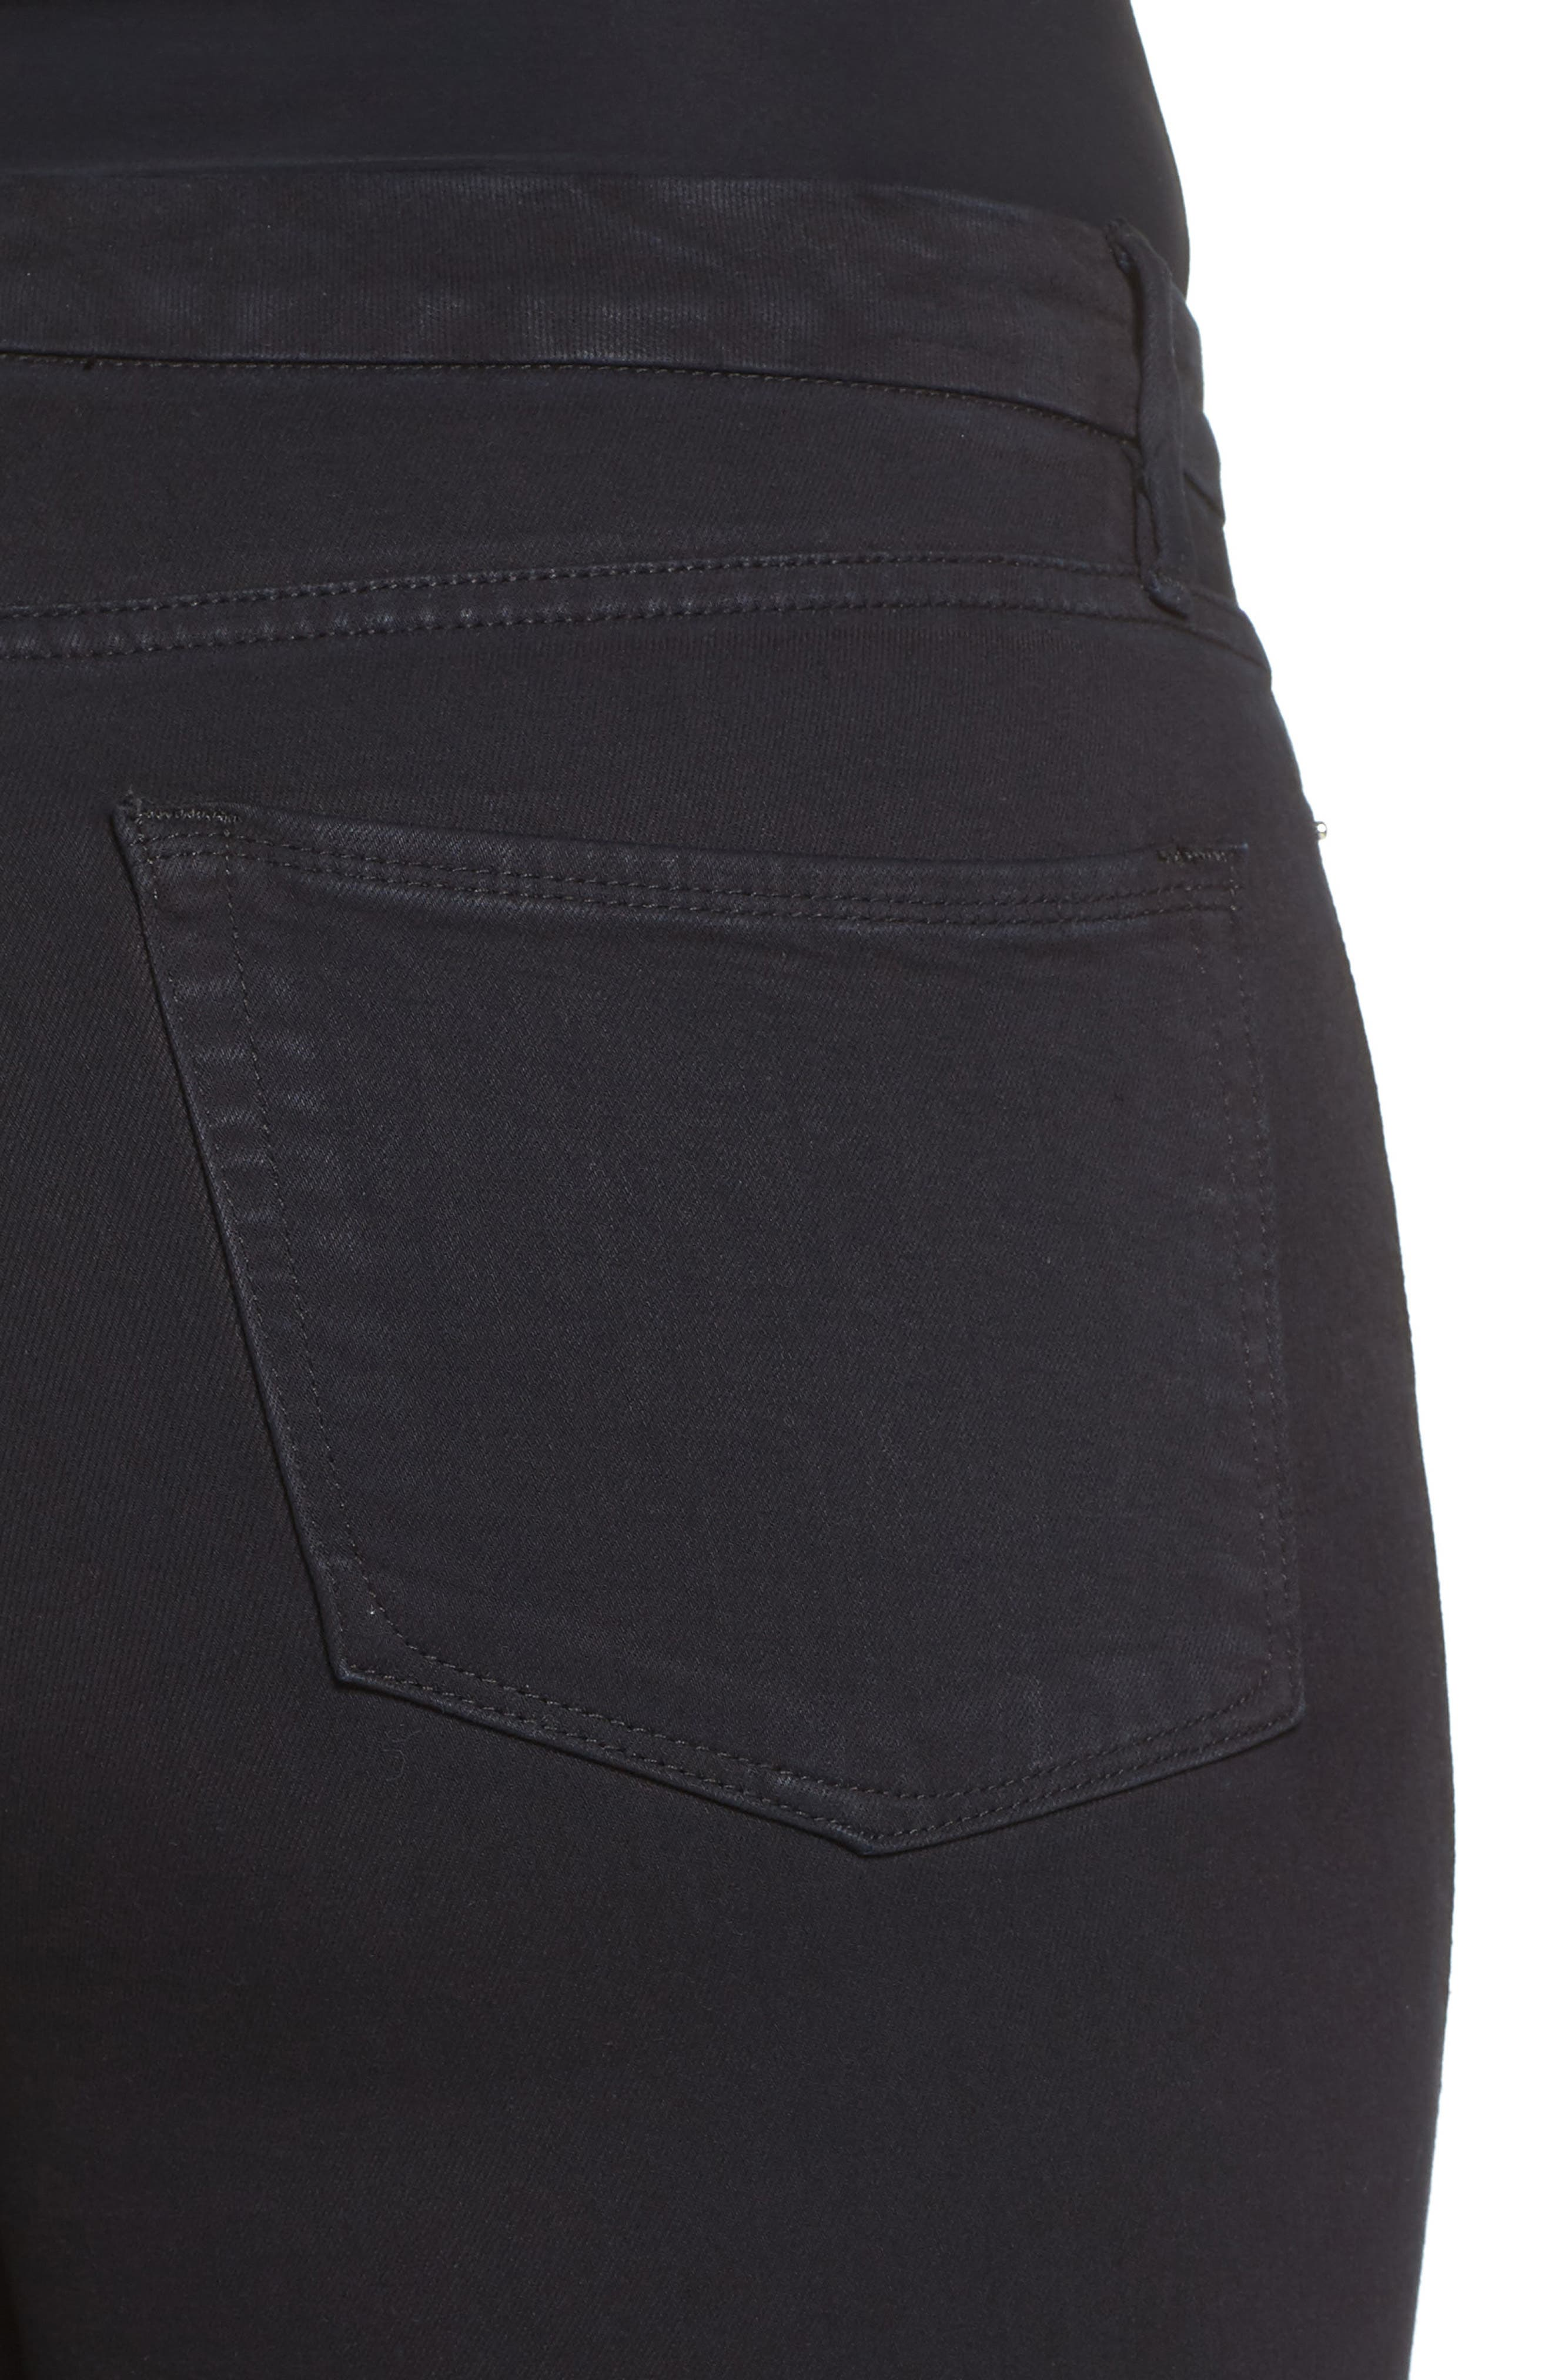 Good Waist High Rise Skinny Jeans,                             Alternate thumbnail 10, color,                             Black 004